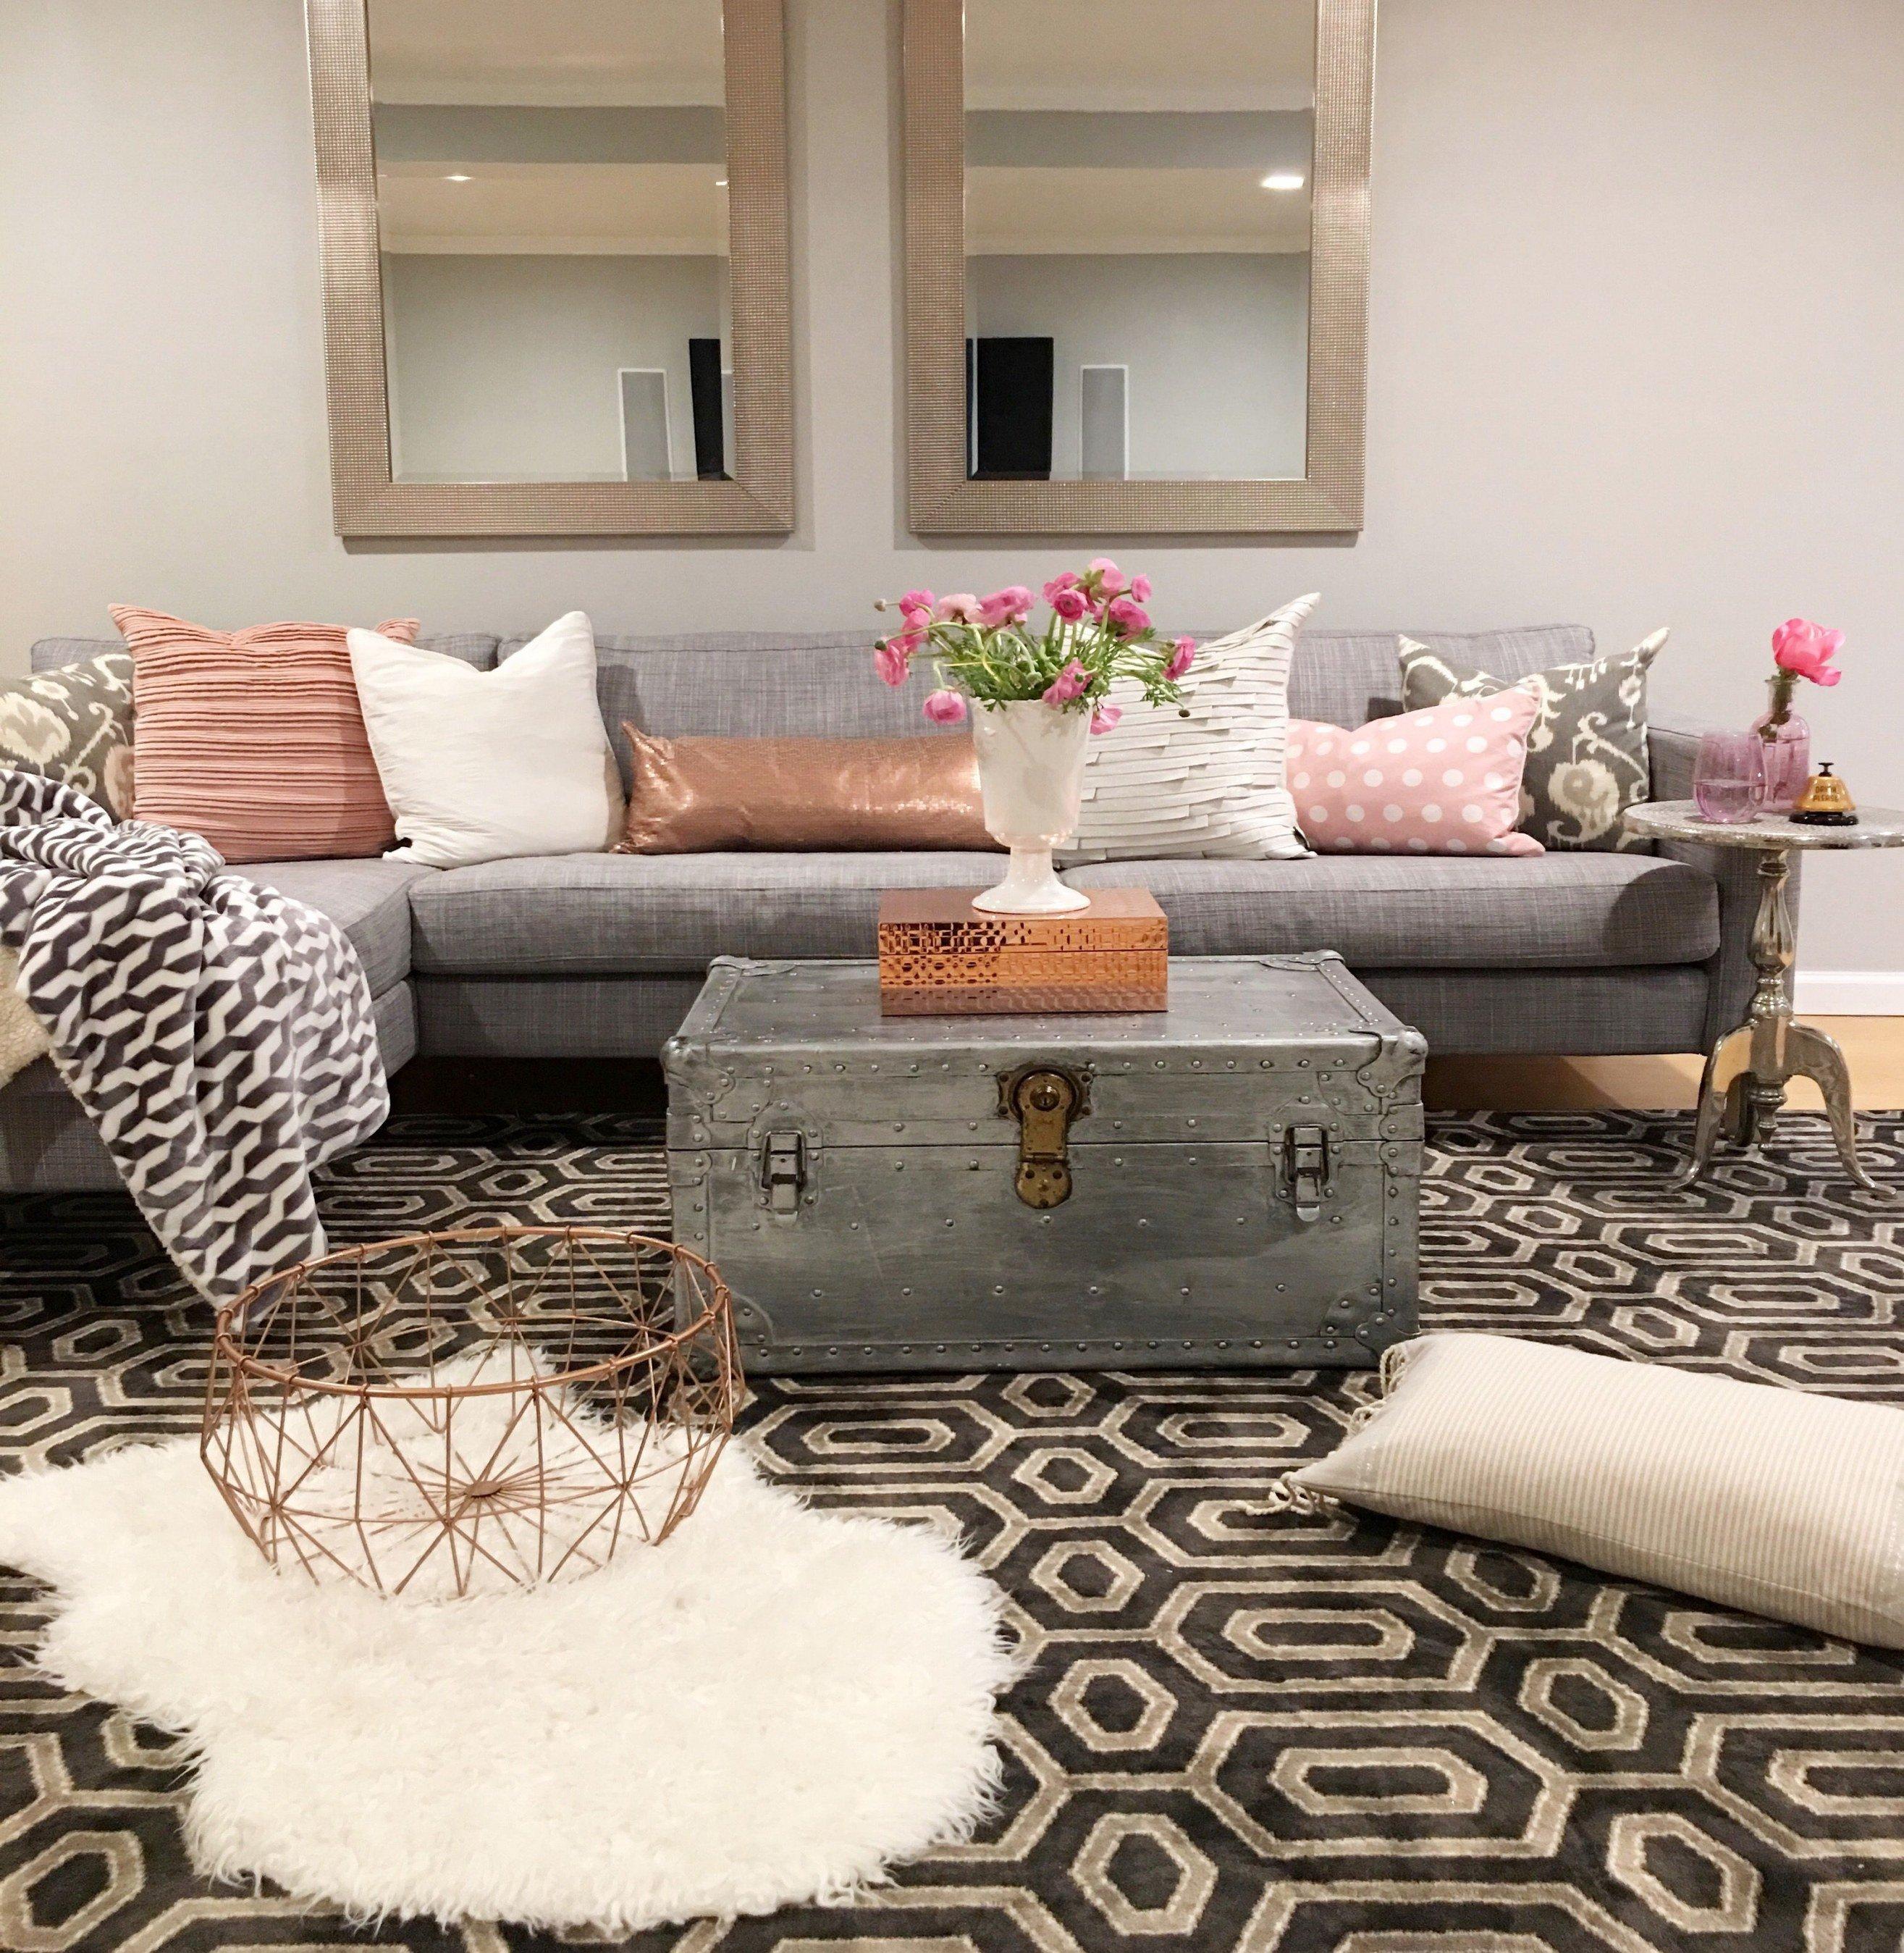 Wood and Metal Bedroom Beautiful Bohemian Decor Diy Bedroom Cool Gray Bedroom Decor Elegant